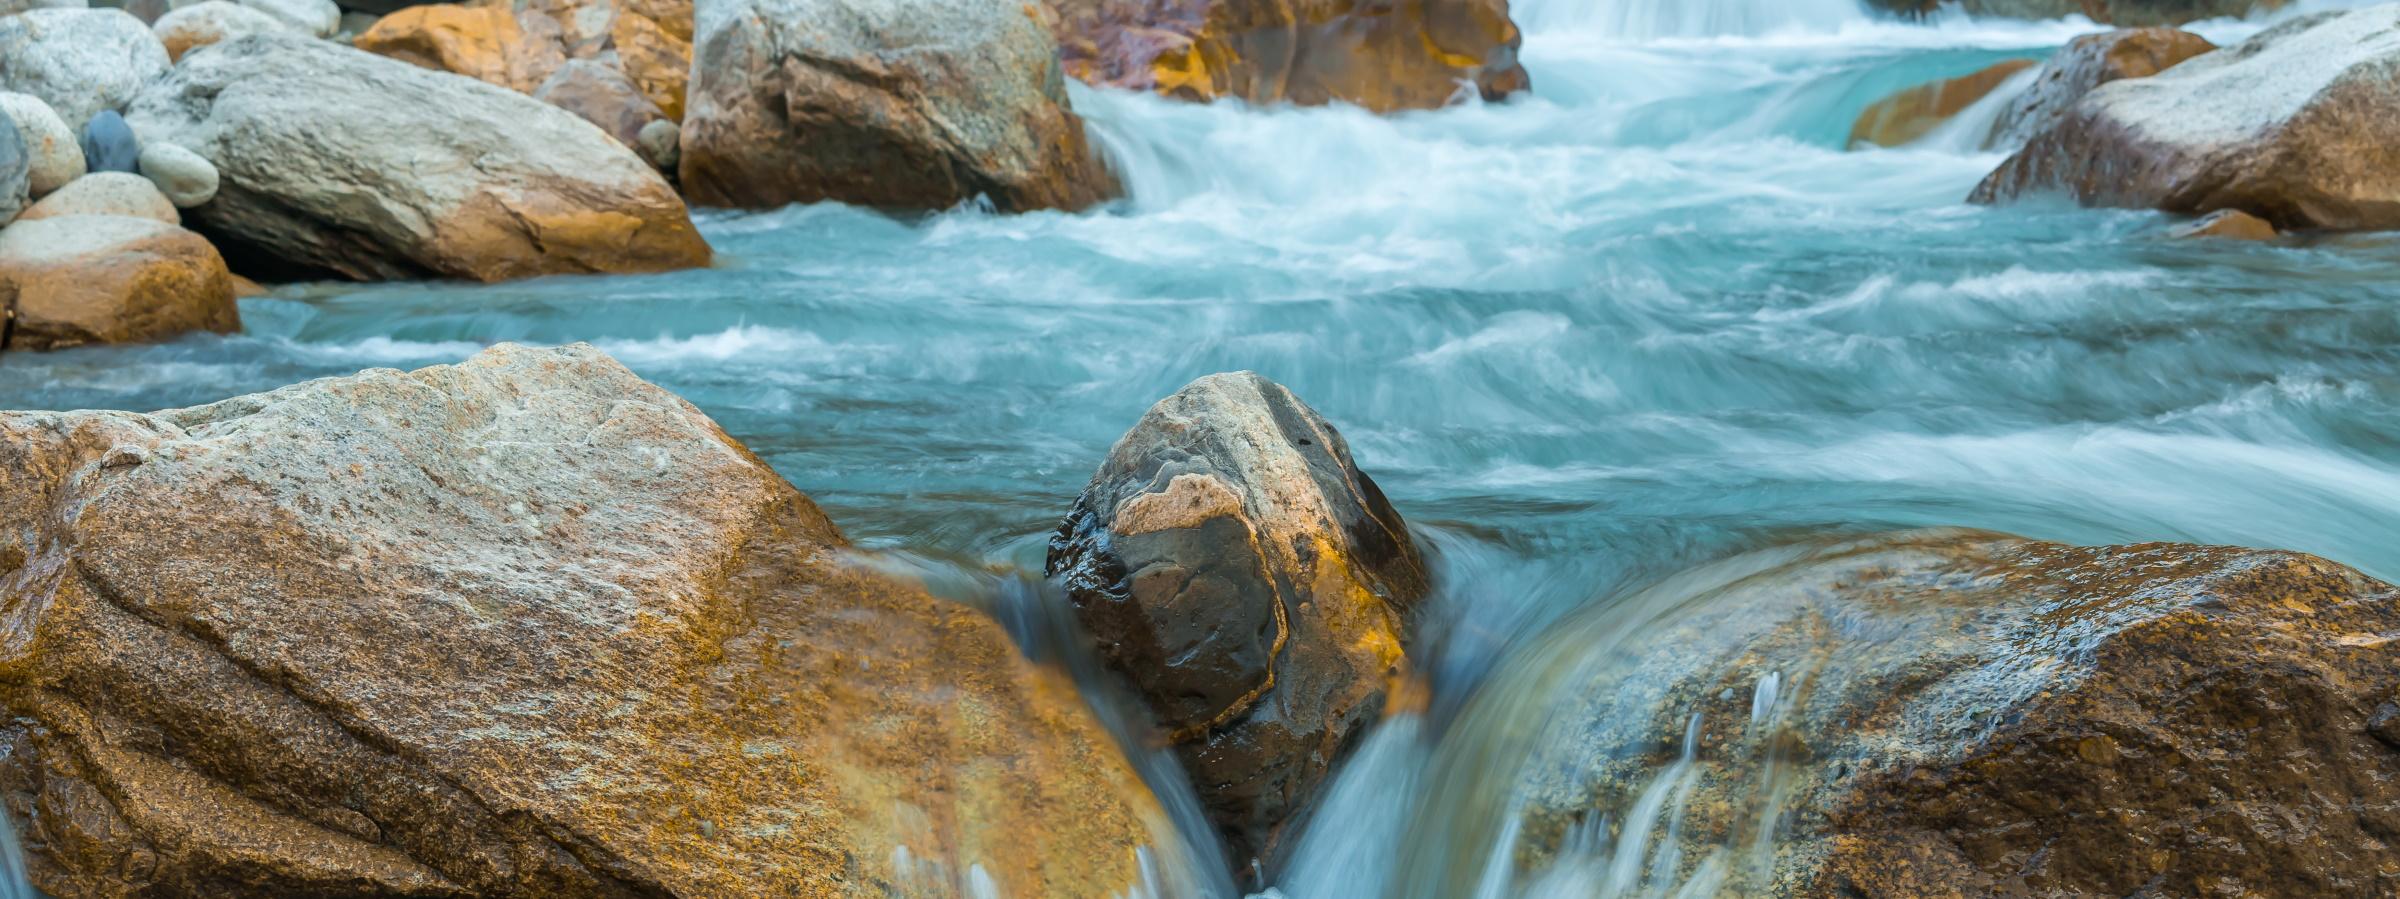 rivière rochers